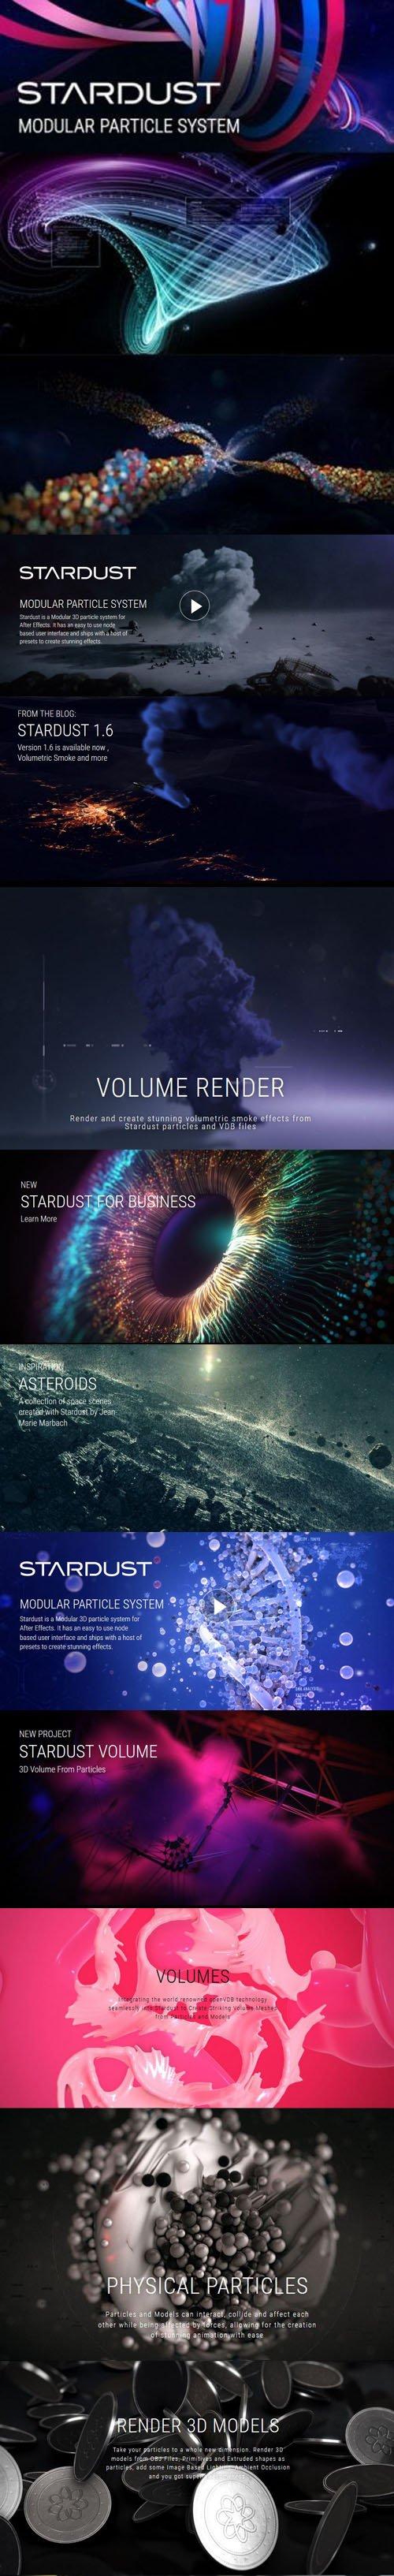 Superluminal Stardust 1.6.0 Plugin for Adobe After Effects